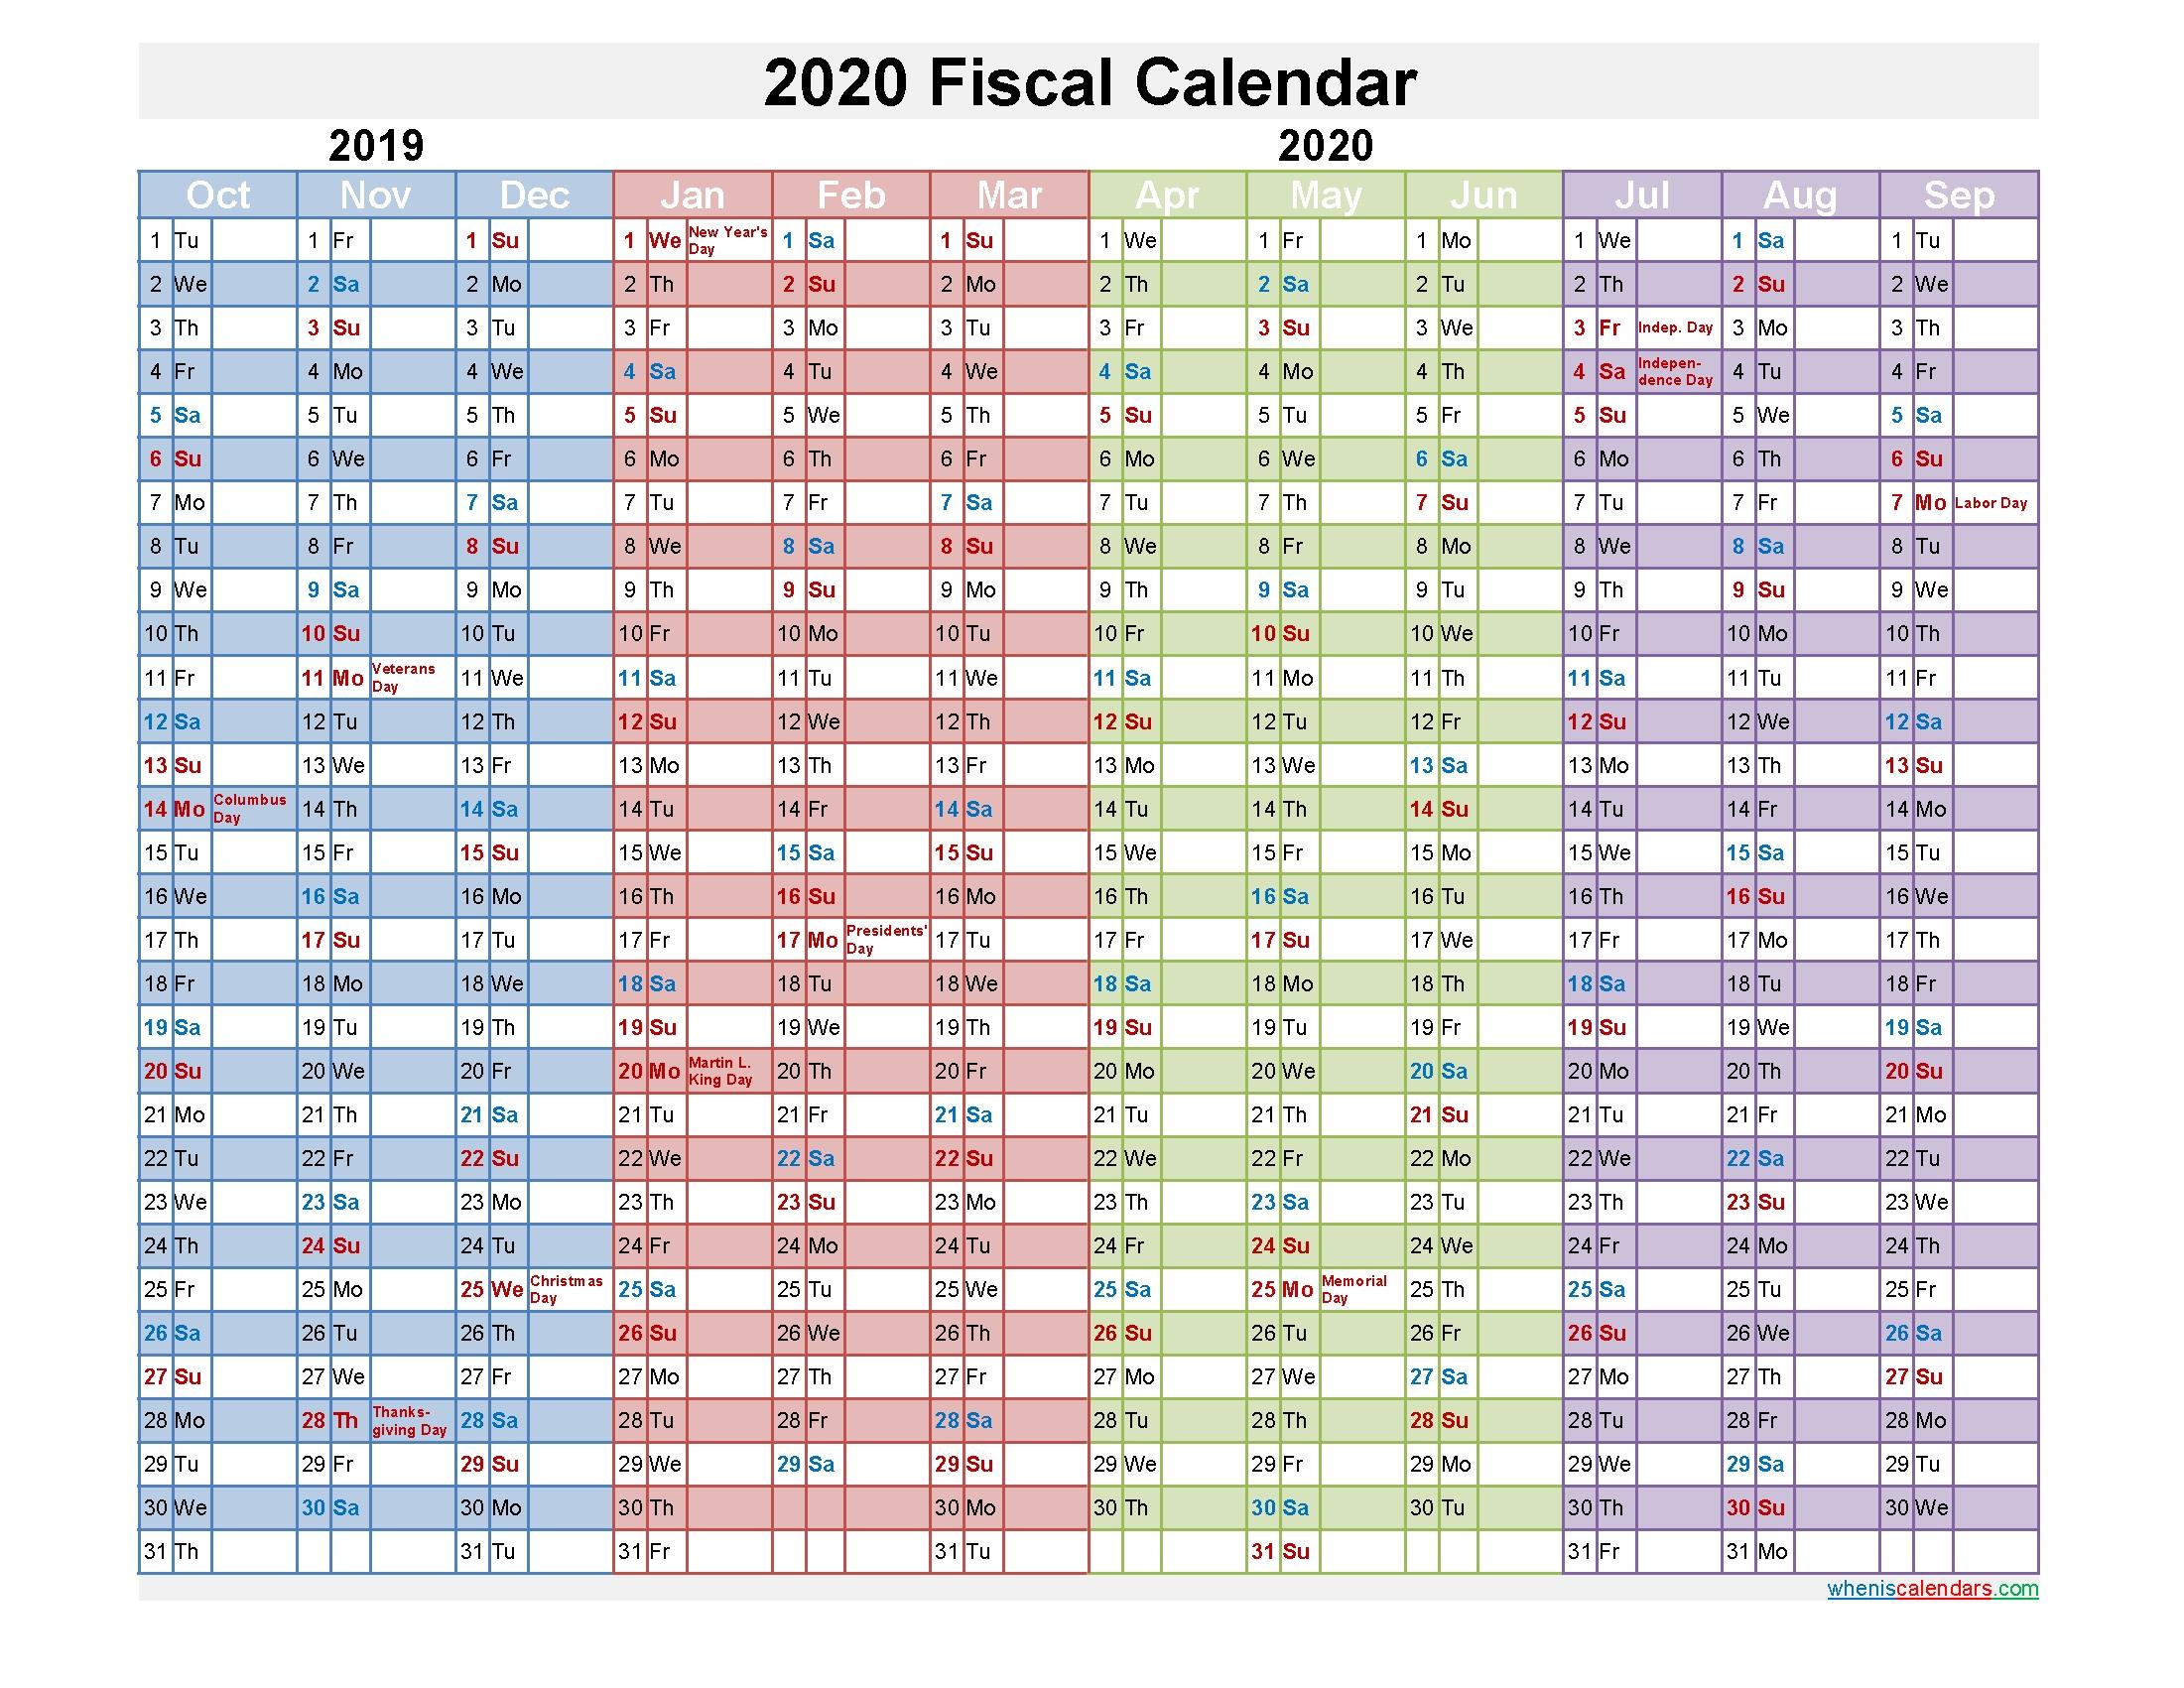 Fiscal Calendar 2020 Federal Fiscal Year - Template No